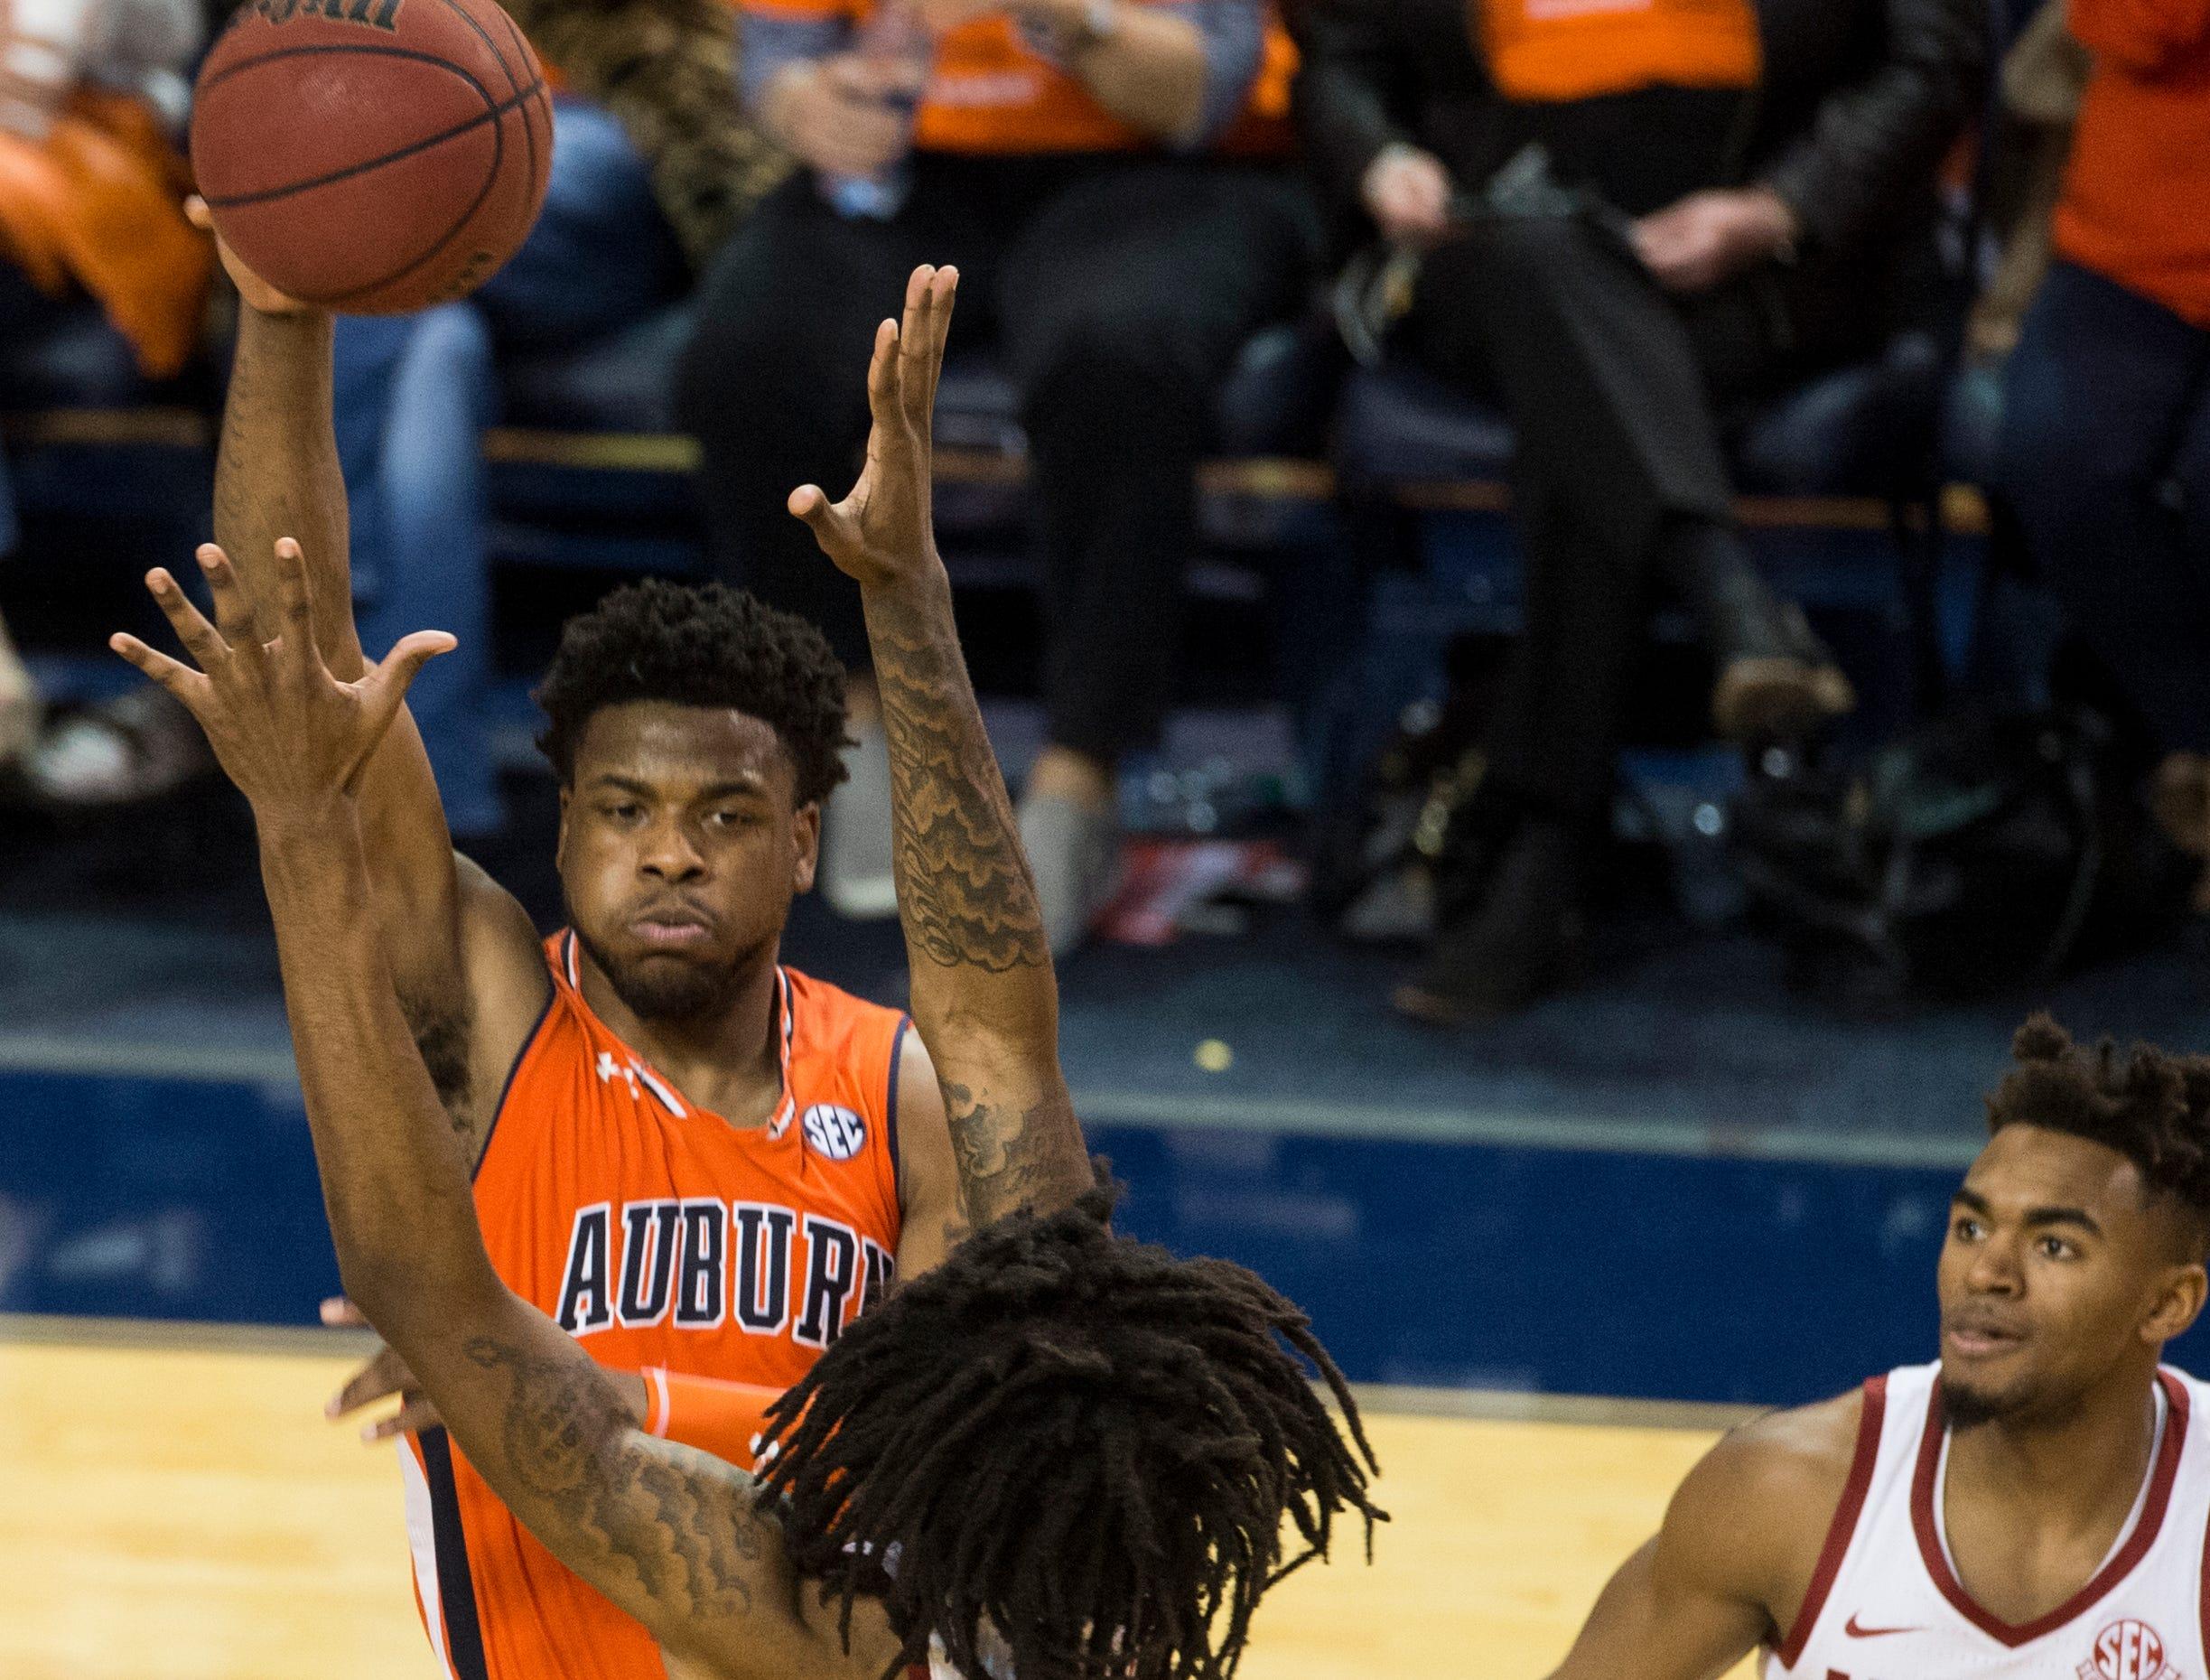 Auburn guard Malik Dunbar (4) passes the ball over Alabama guard John Petty (23) at Auburn Arena in Auburn, Ala., on Saturday, Feb. 2, 2019. Auburn defeated Alabama 84-63.